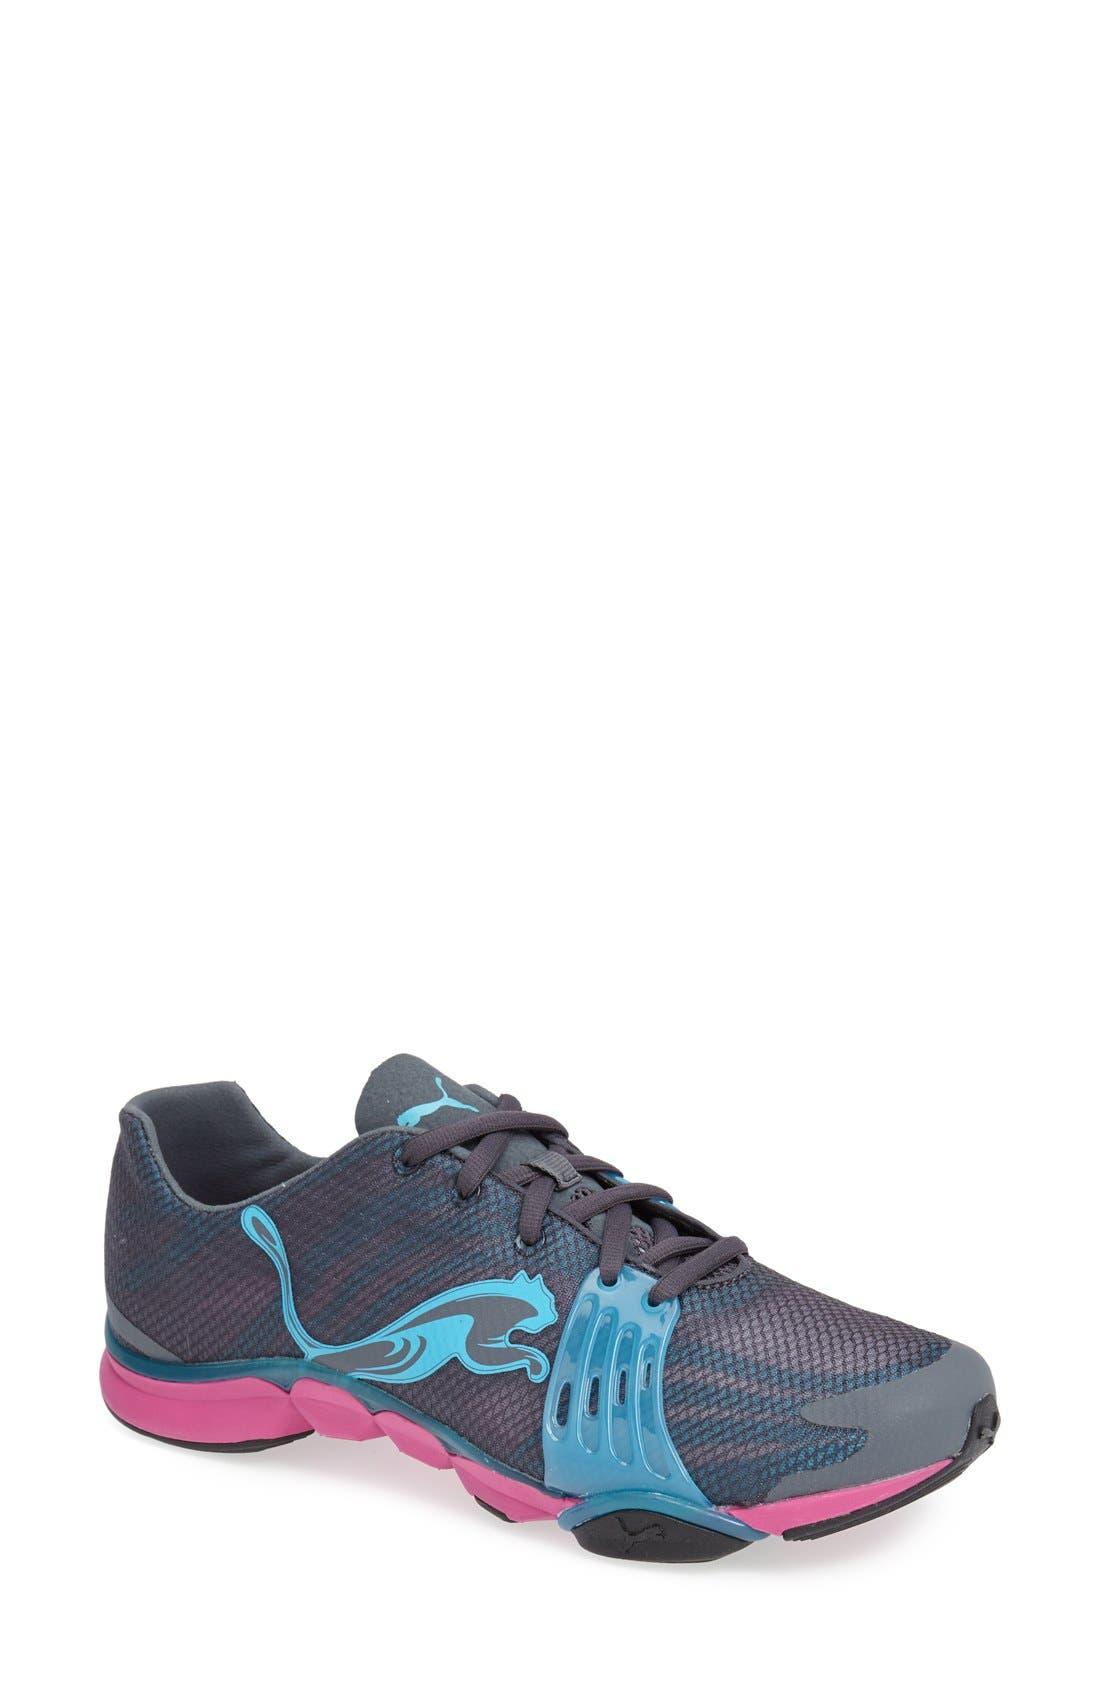 Alternate Image 1 Selected - PUMA 'Mobium XT' Training Shoe (Women)